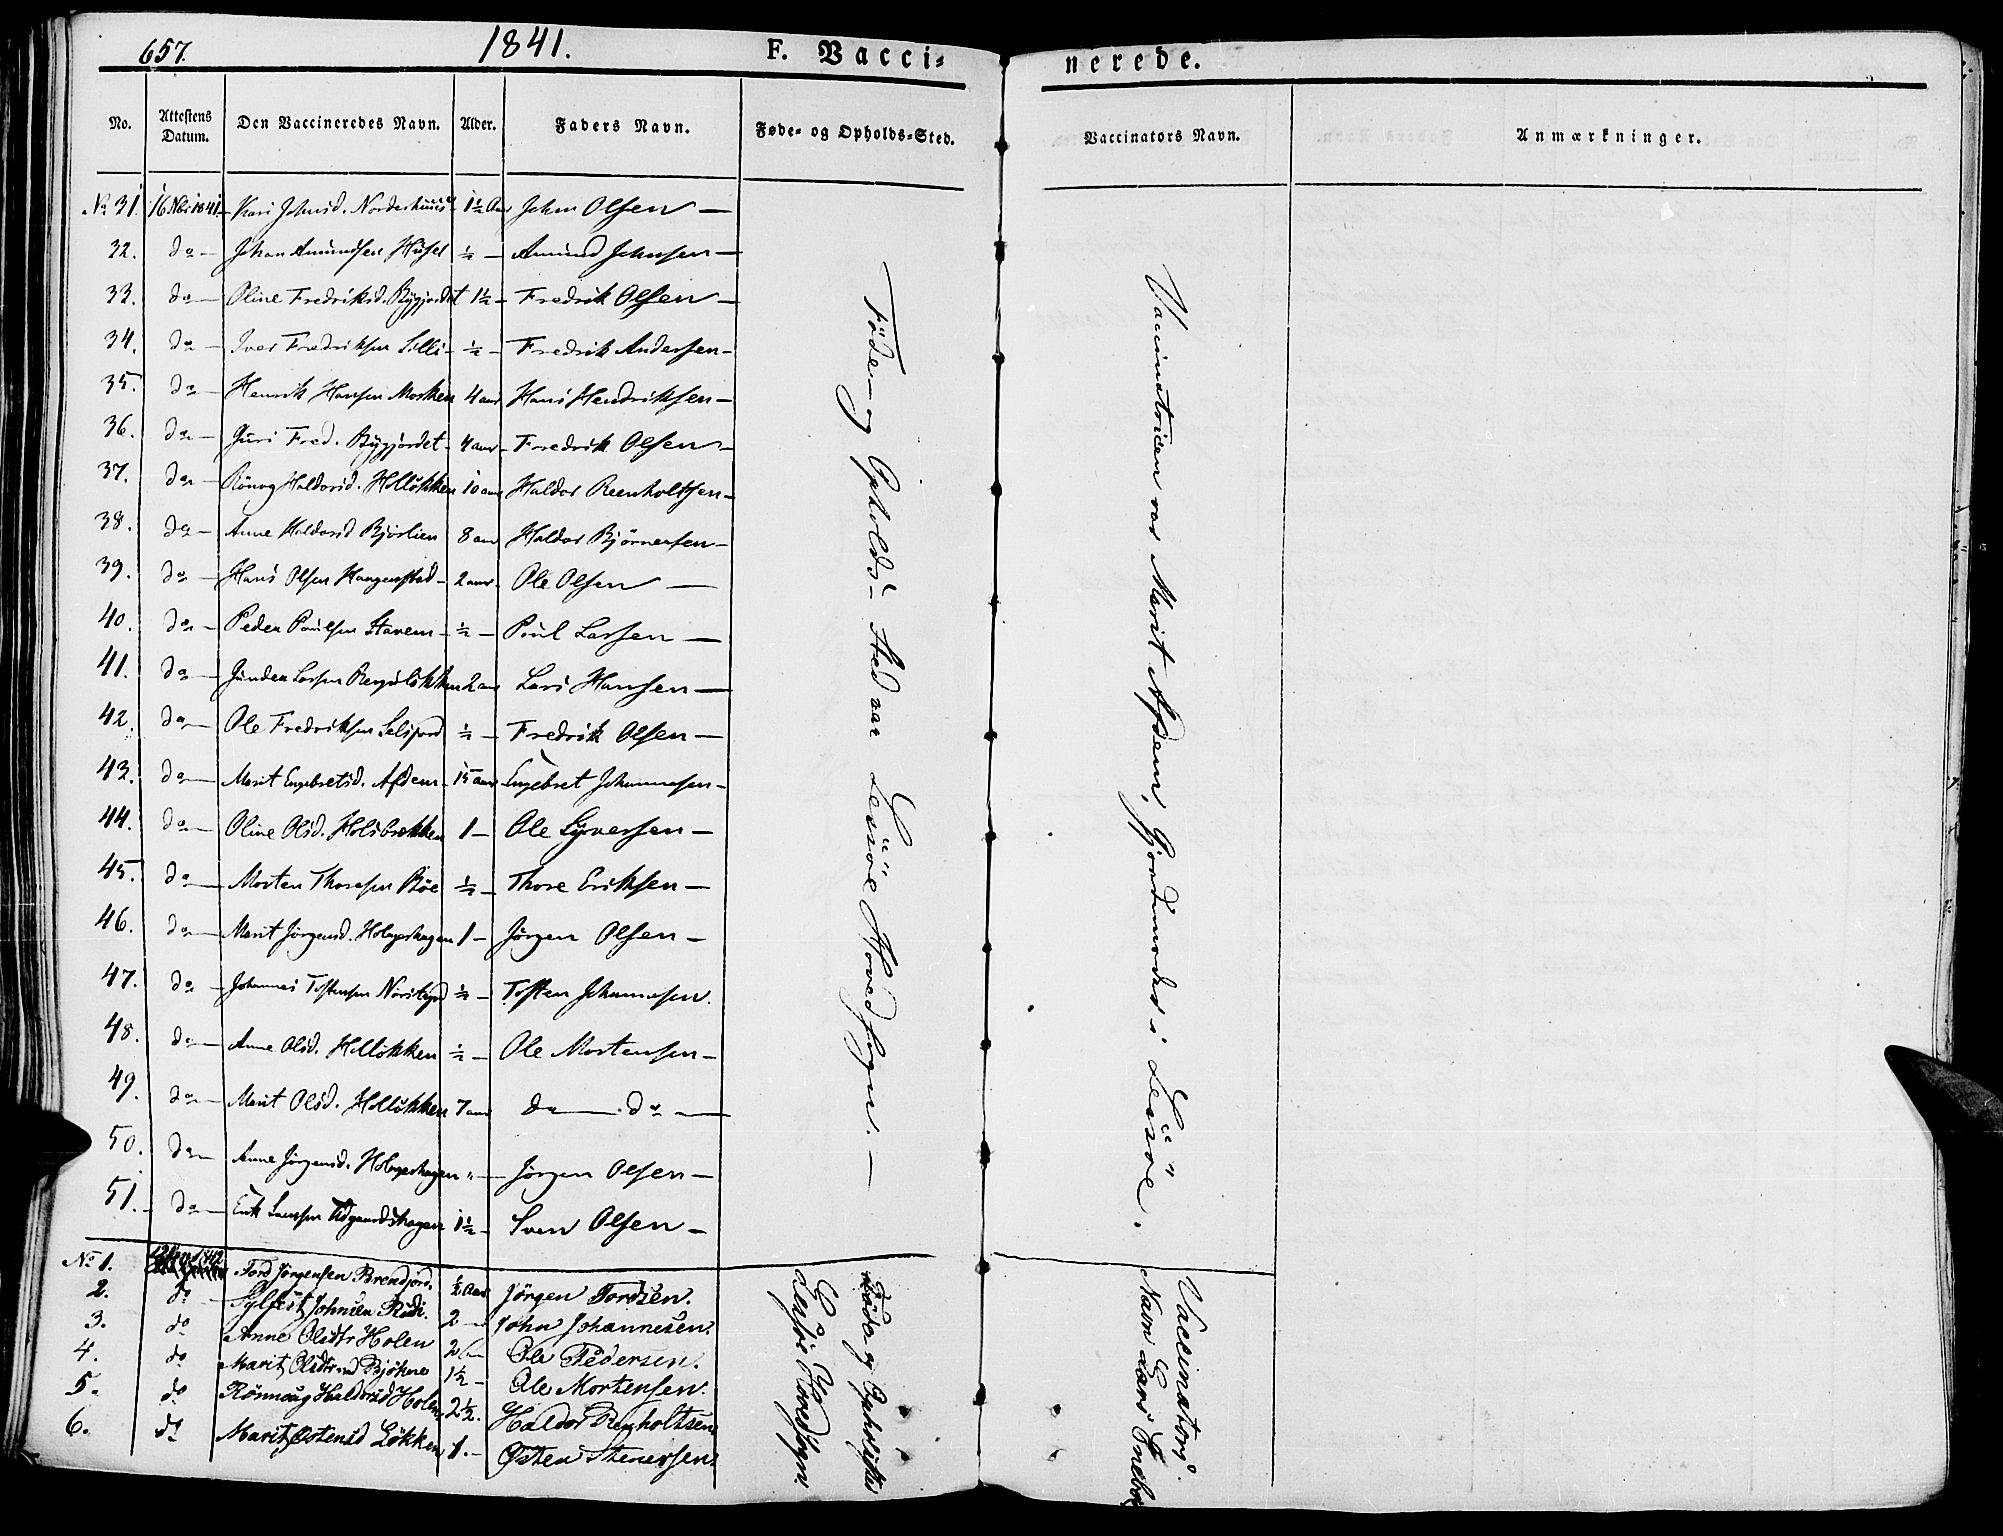 SAH, Lesja prestekontor, Ministerialbok nr. 5, 1830-1842, s. 657